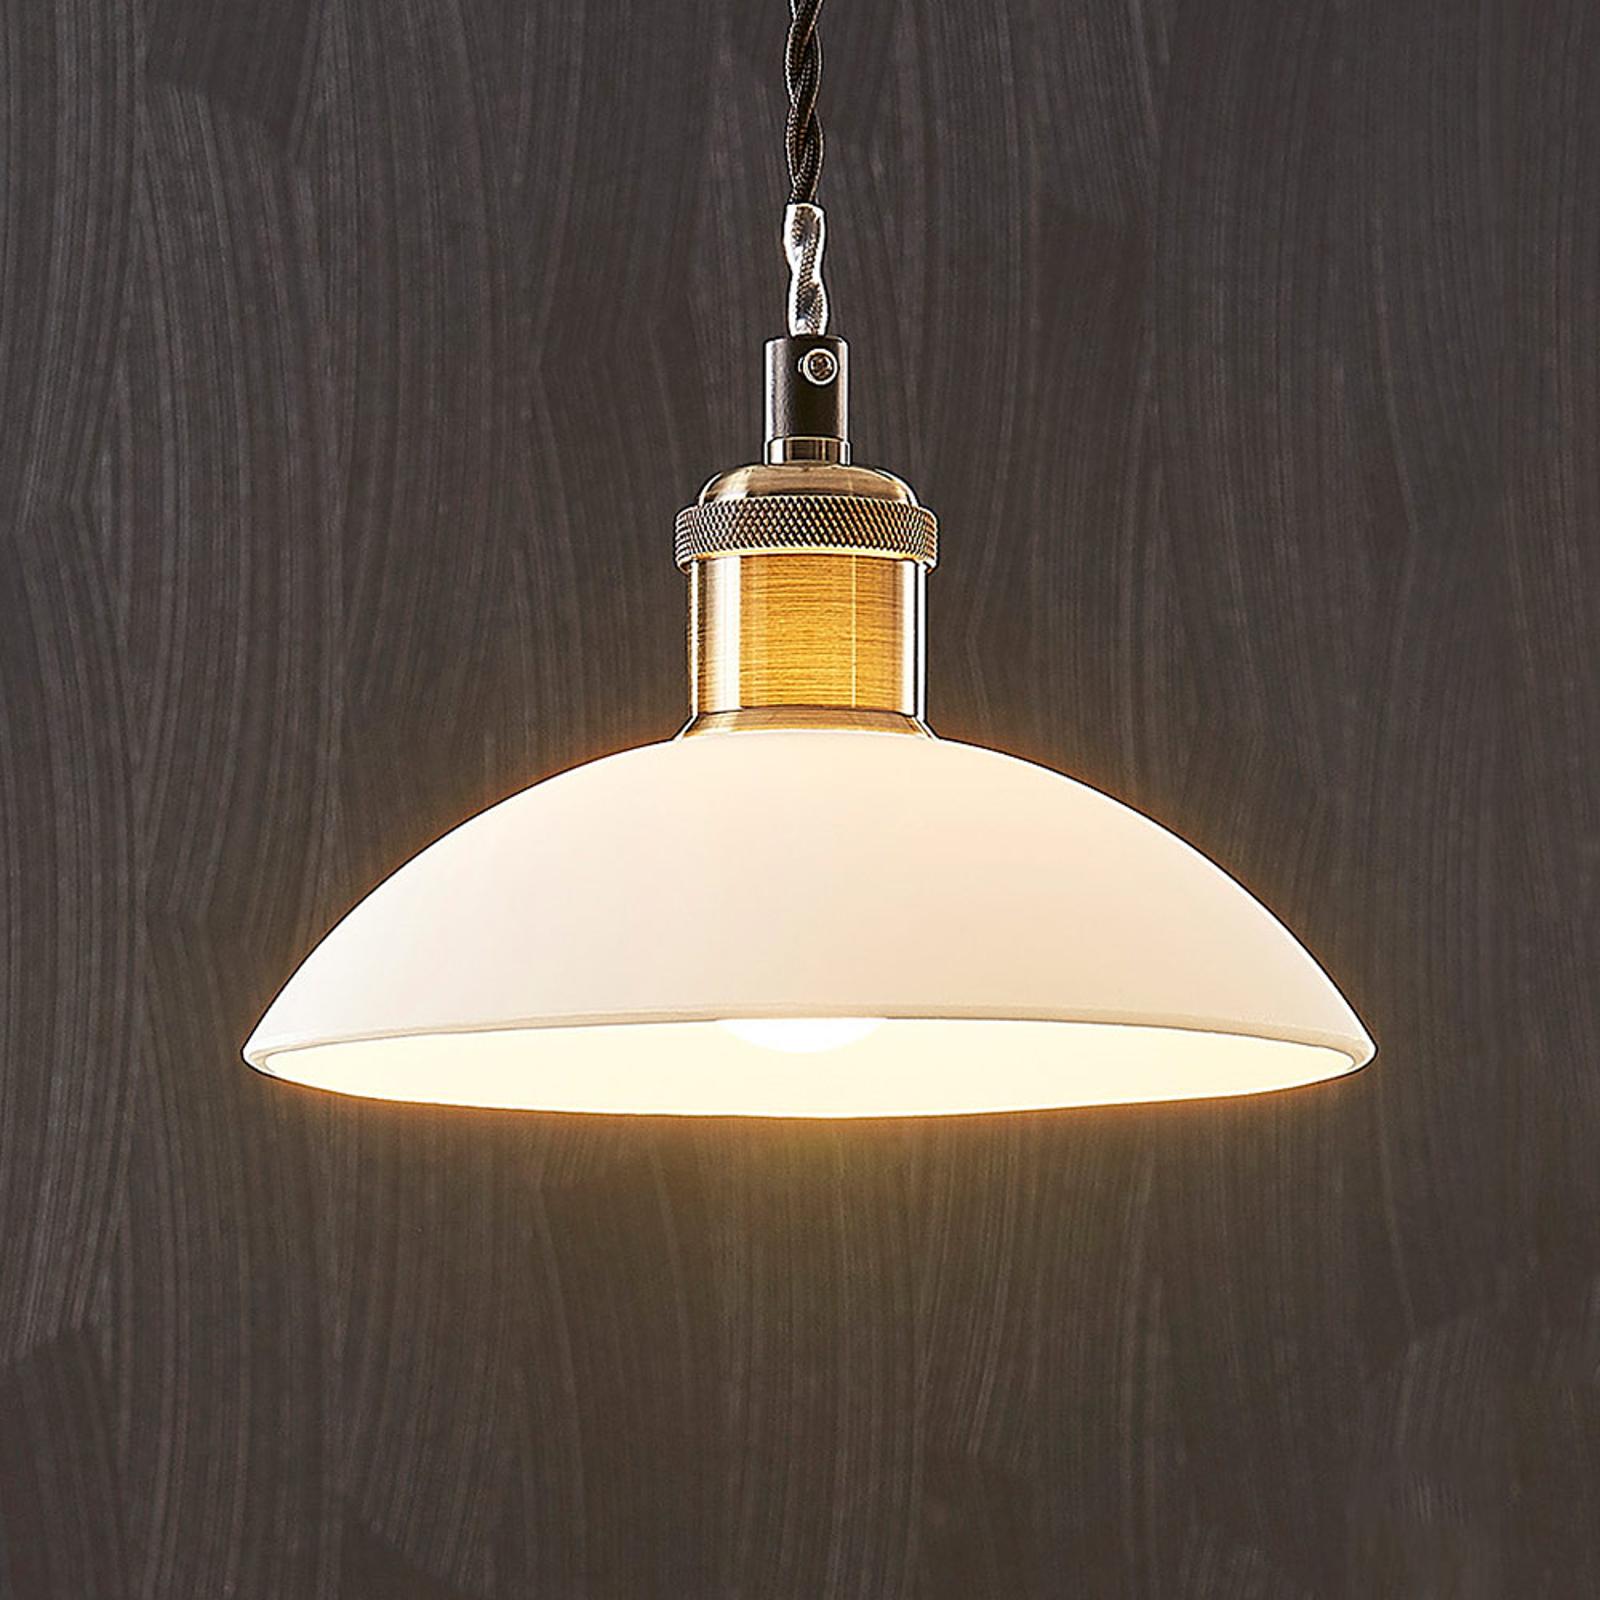 Glazen hanglamp Samu, antiek messingkleurig